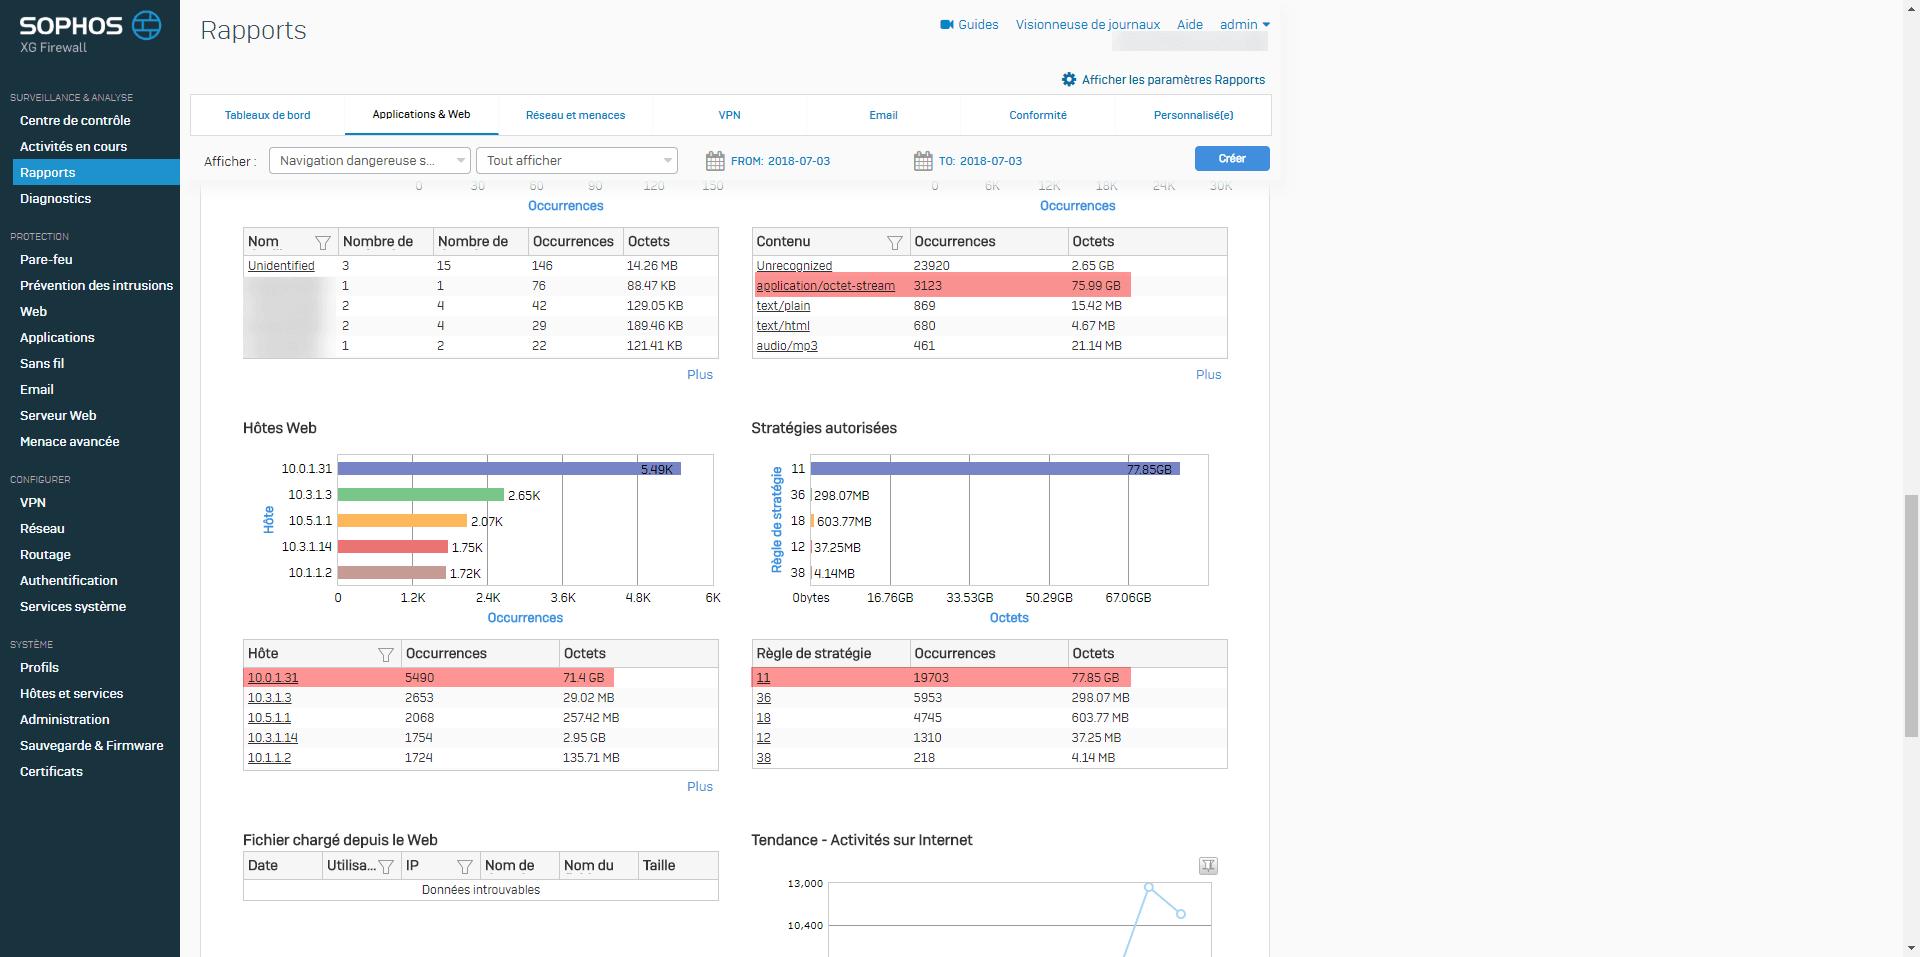 Sophos XG high traffic on the BITS application - RDR-IT